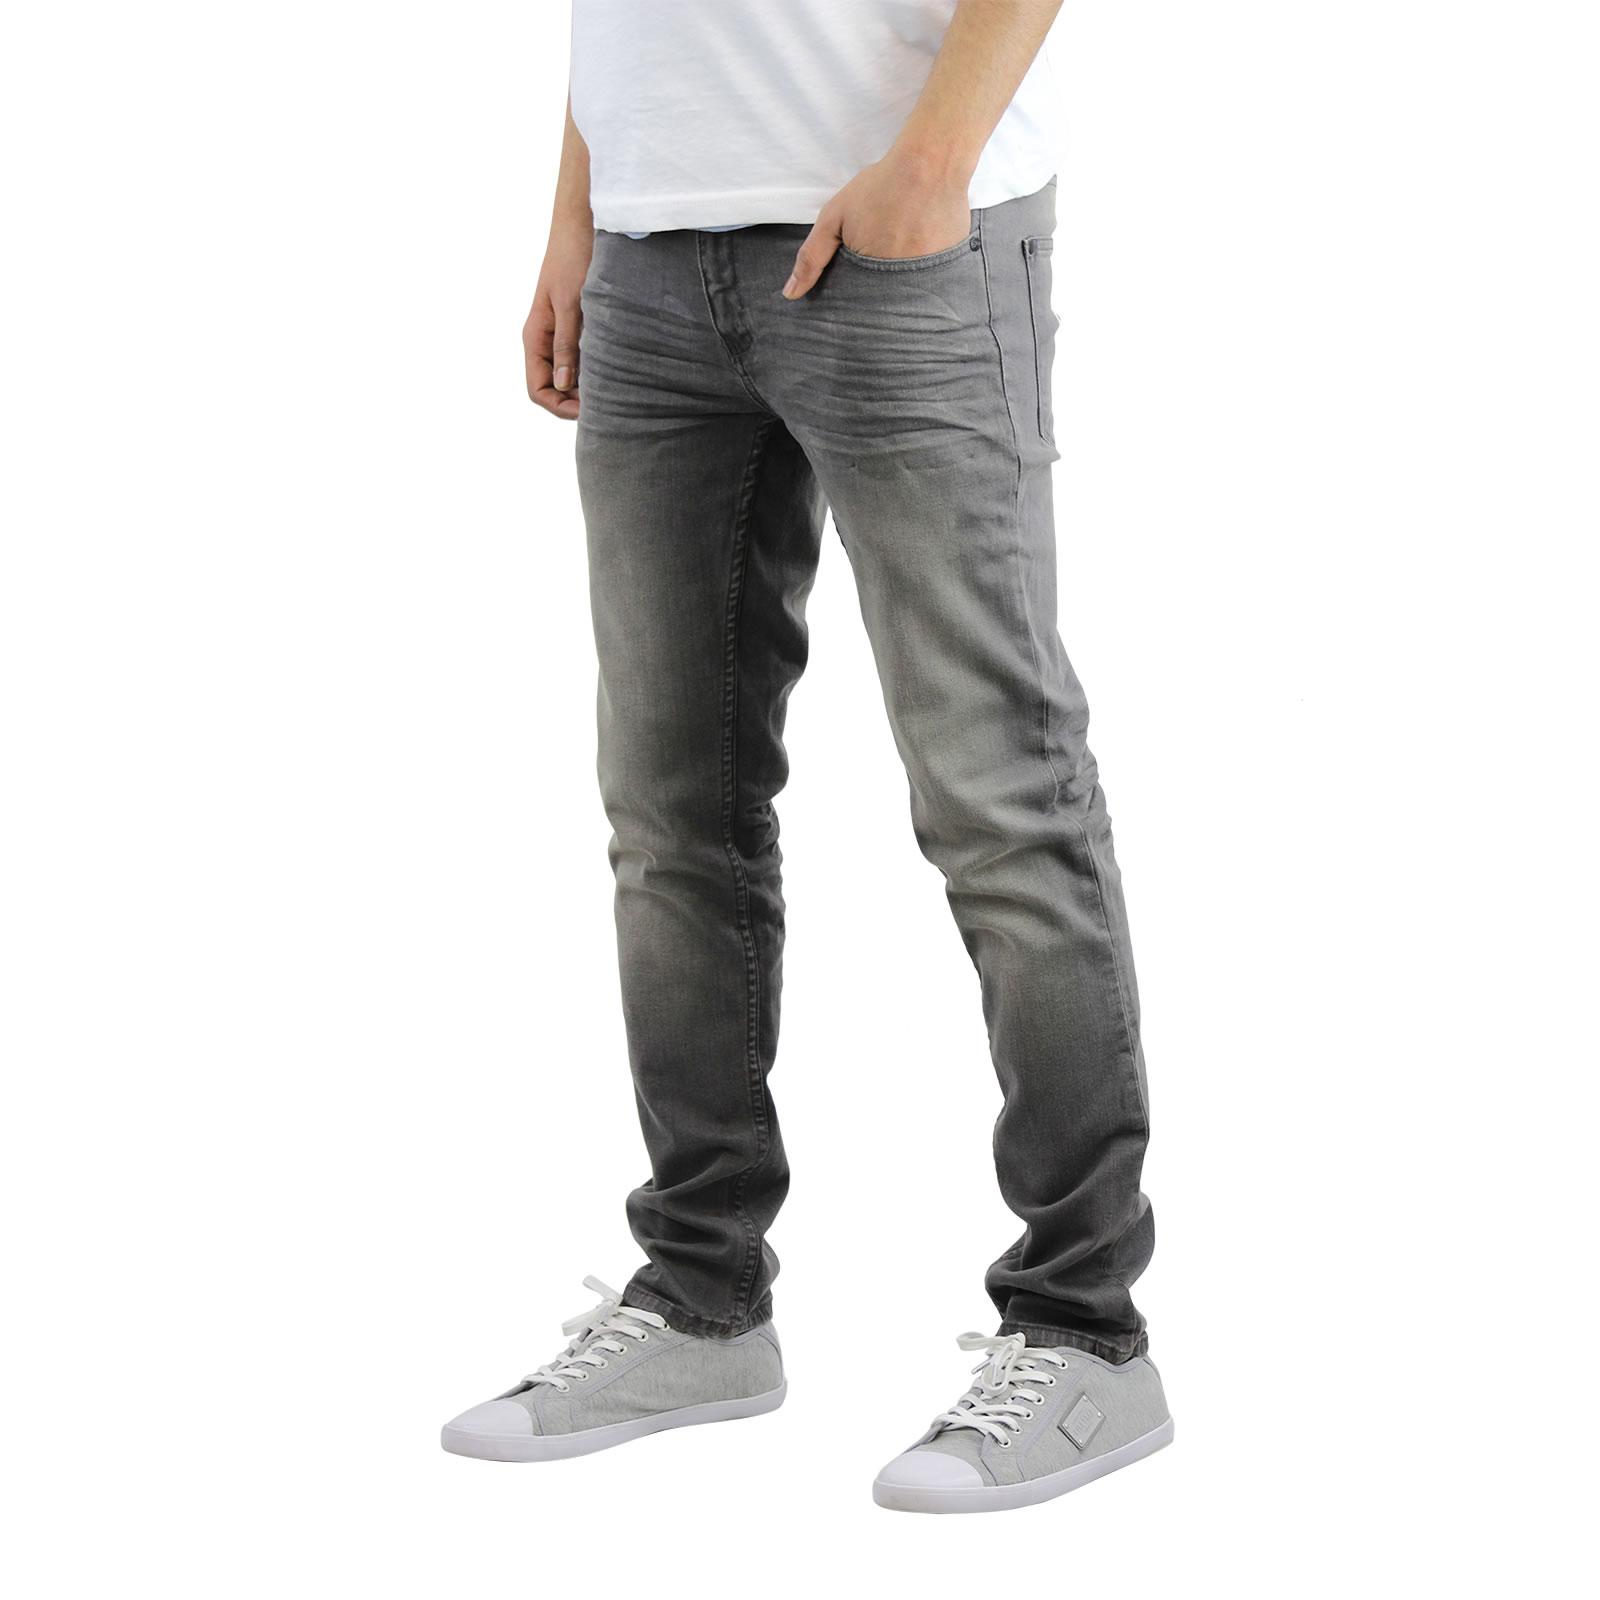 miniature 9 - Homme Crosshatch Jaco Slim Jeans stretch pantalon denim effet vieilli